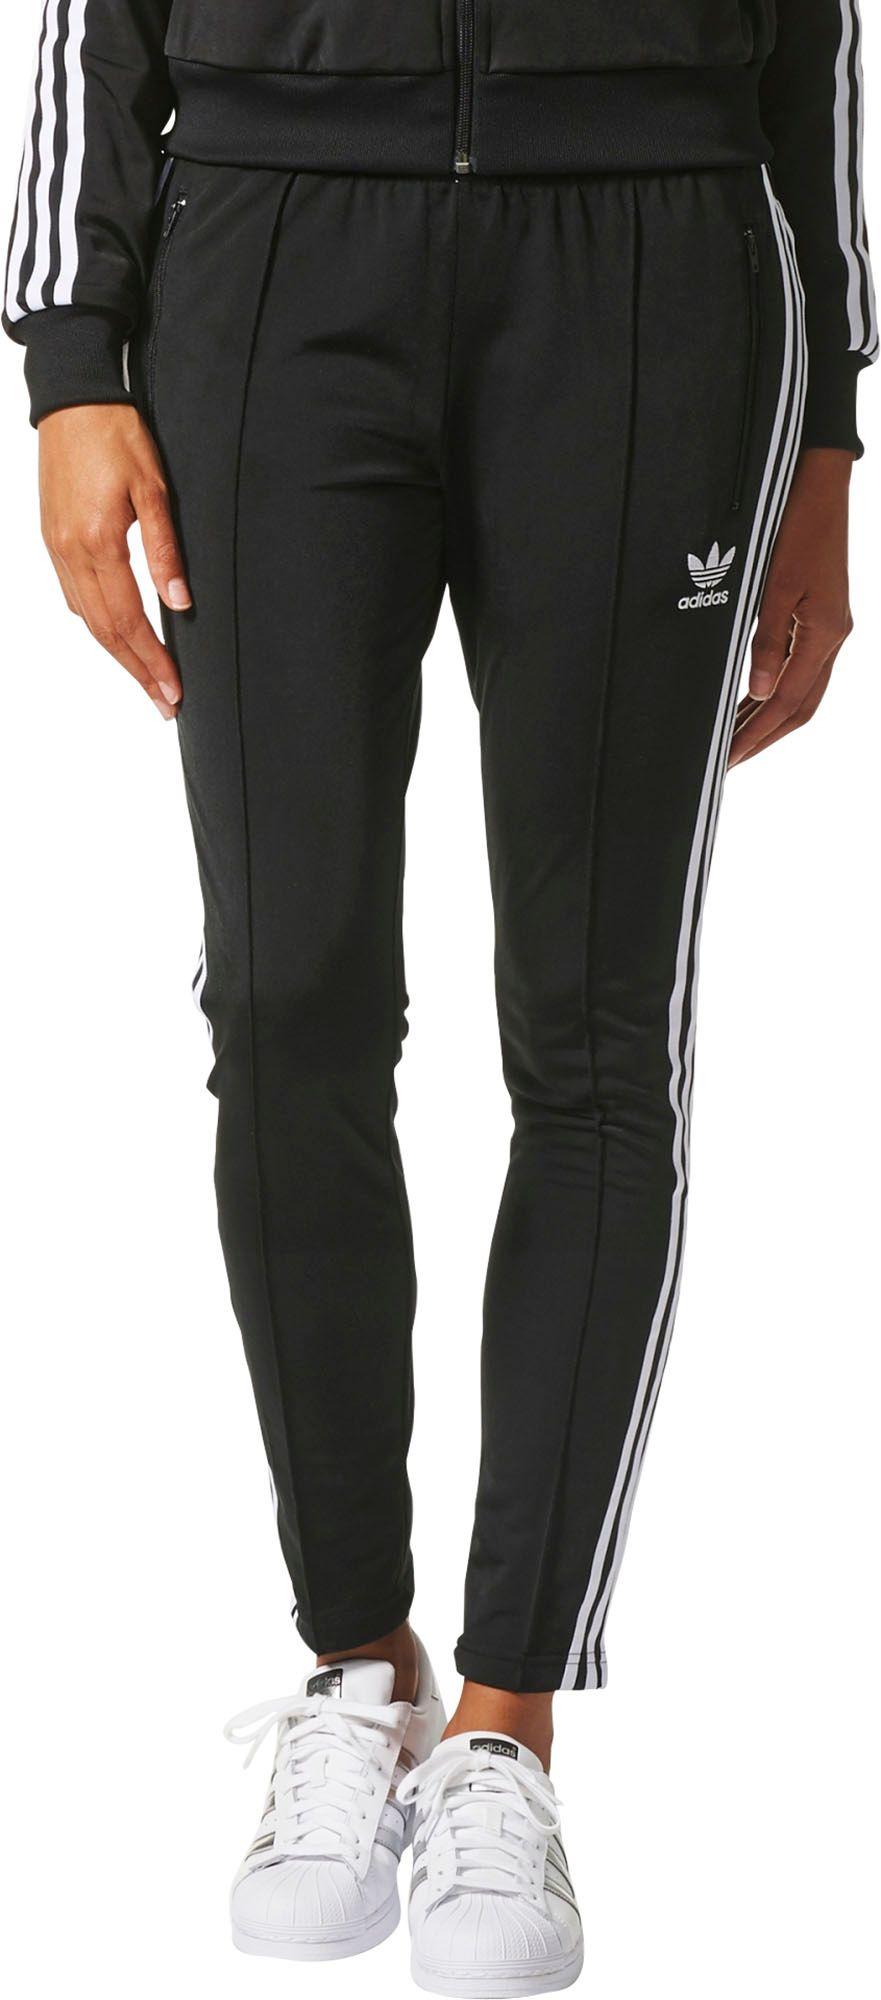 adidas t10 t10 pantalones pantalones 11313 nanikana 5979475 - rspr.host